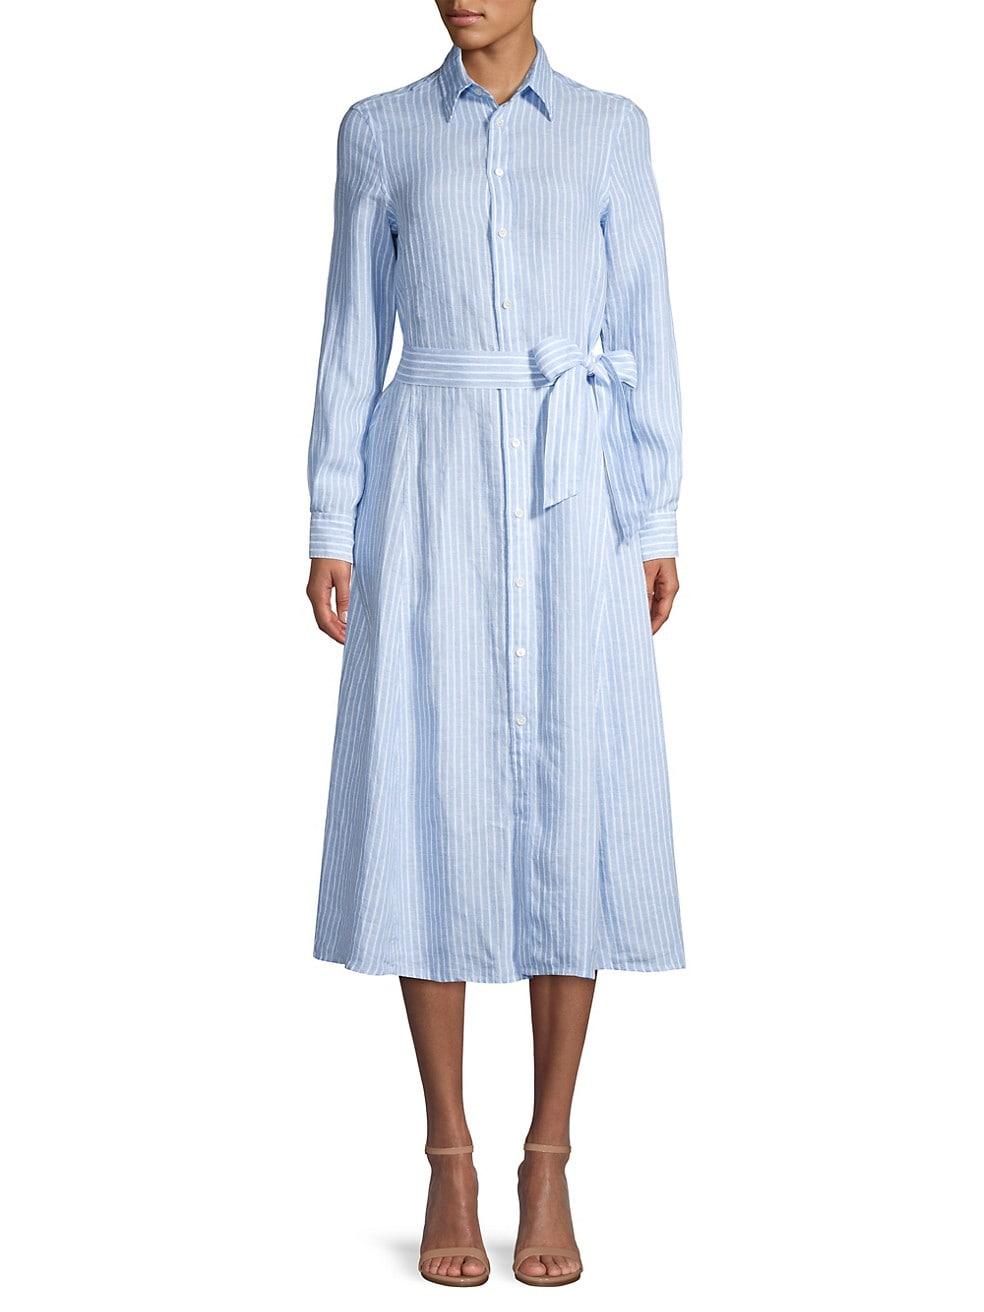 Ashton Striped Linen Shirt Dress